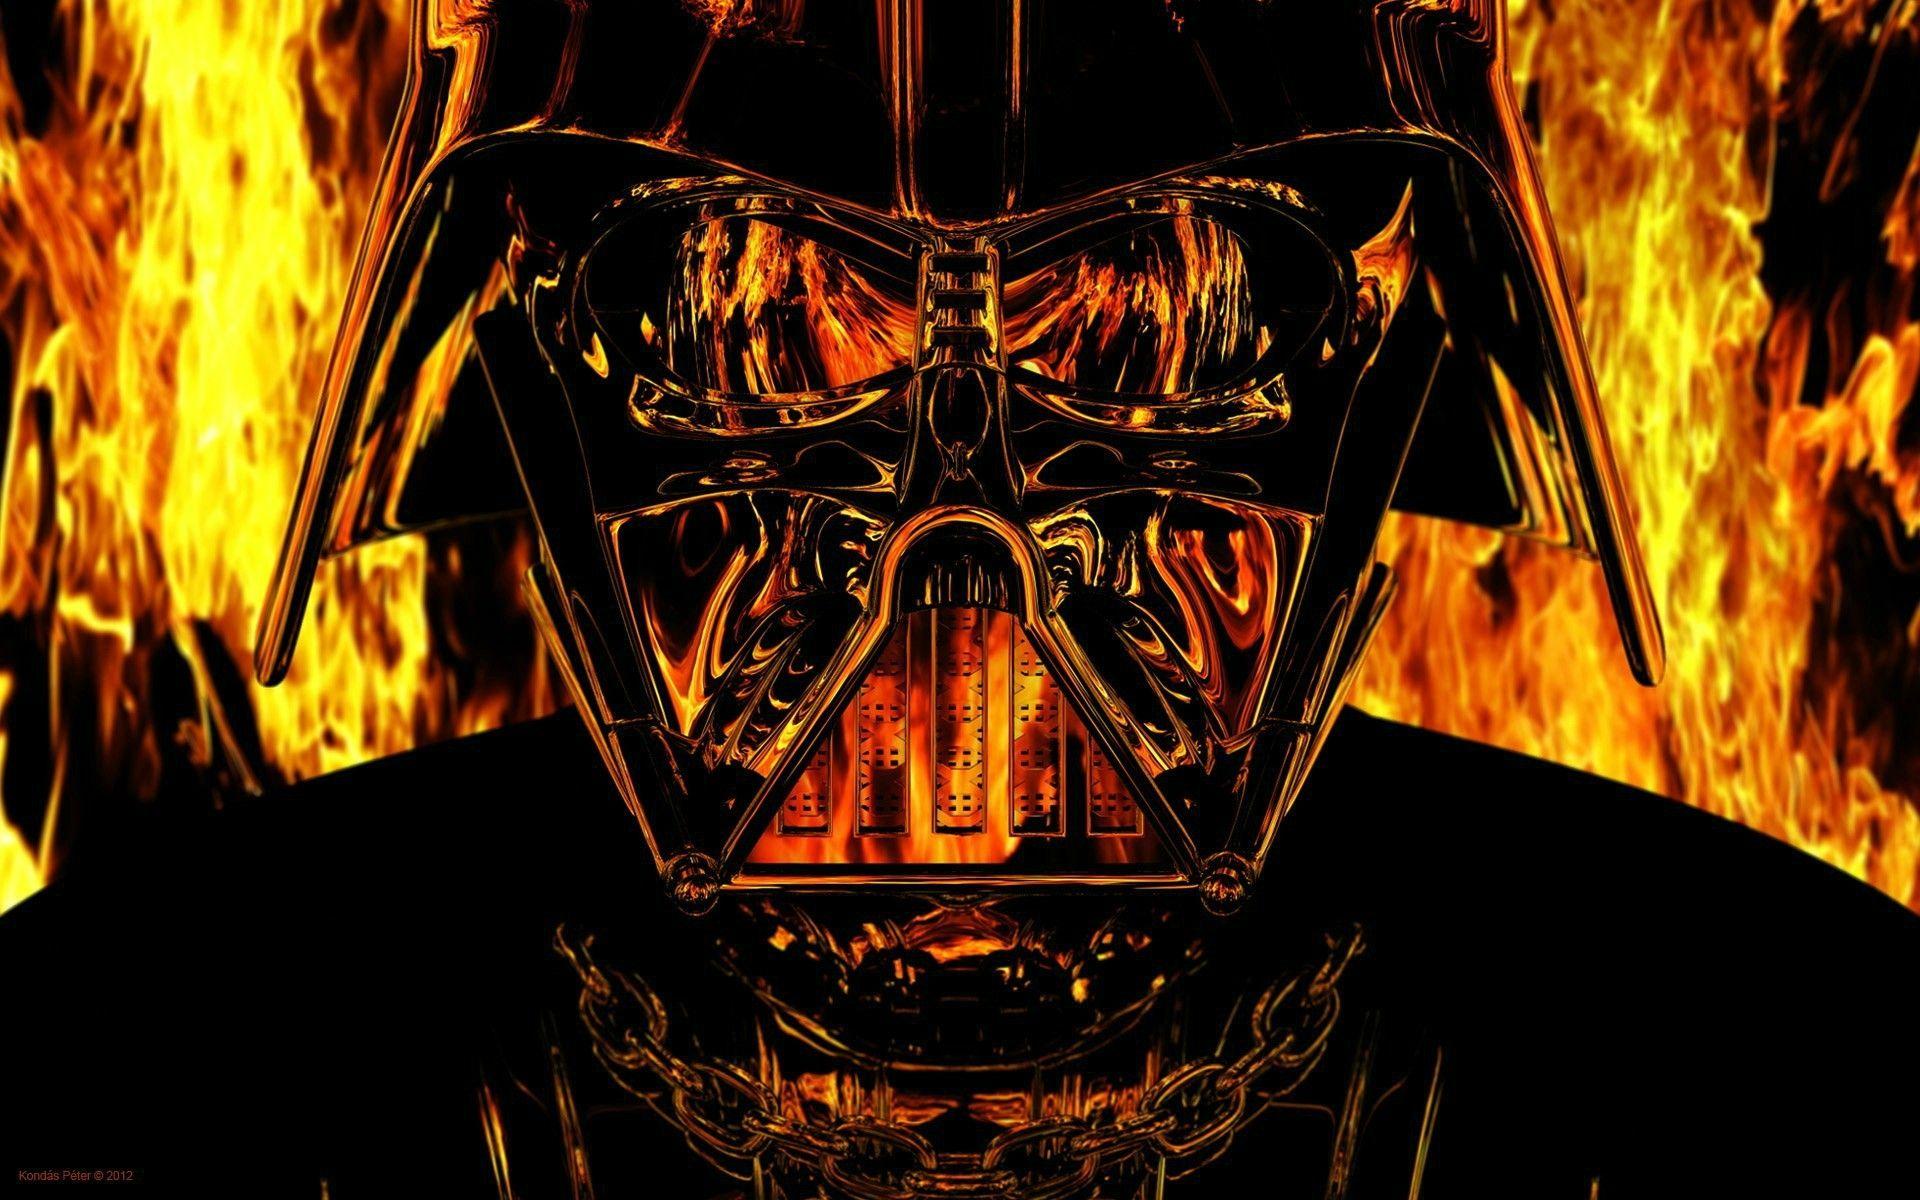 Awesome Star Wars Wallpapers Star Wars Wallpaper Darth Vader Wallpaper Star Wars Poster